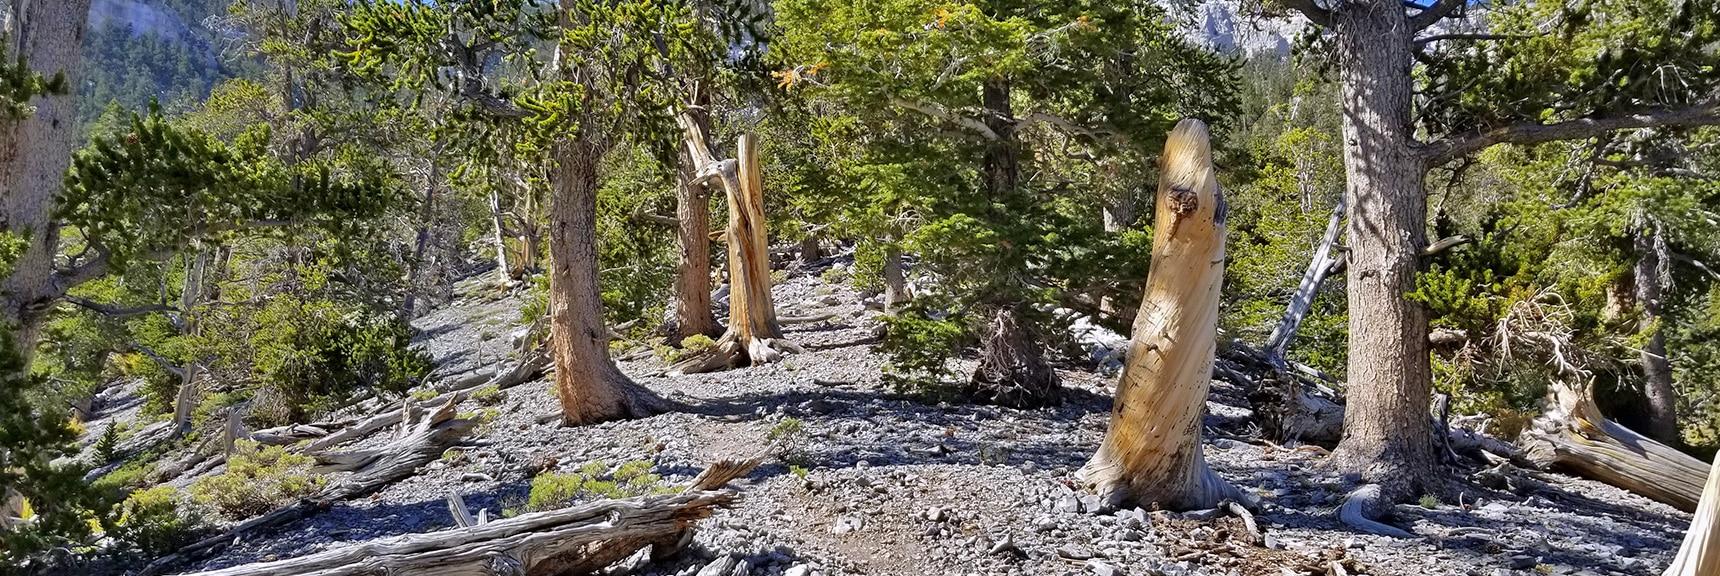 Ancient Bristlecone Pine Forest on Upper Cougar Ridge Trail | Mummy Springs Loop | Mt. Charleston Wilderness | Spring Mountains, Nevada